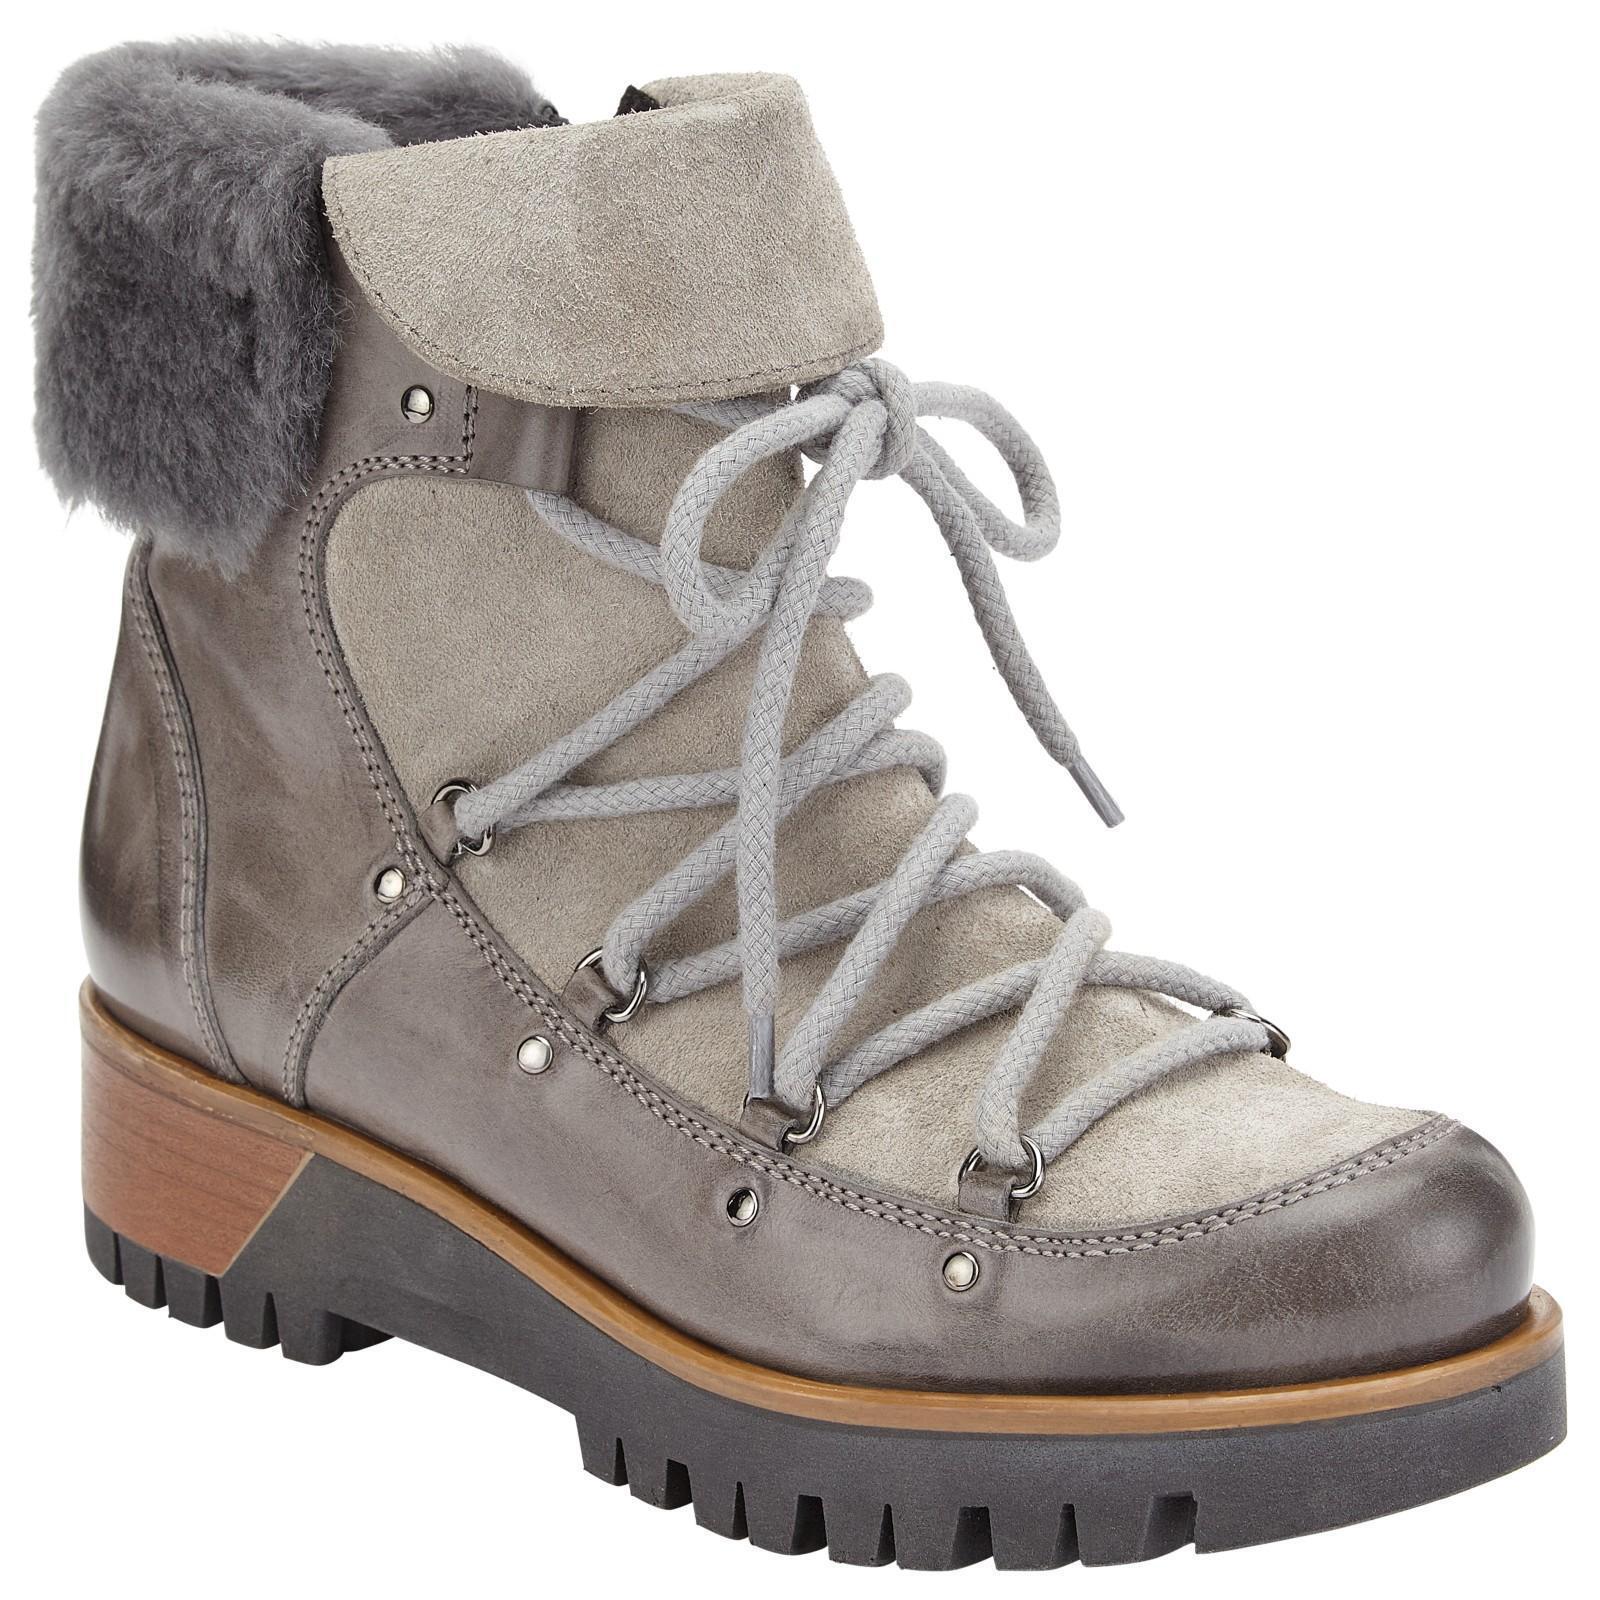 John Cuero Lewis Filomena Gamuza Cuero John Cremallera Excursionista Tobillo botas De Invierno gris 6 & 8 026116